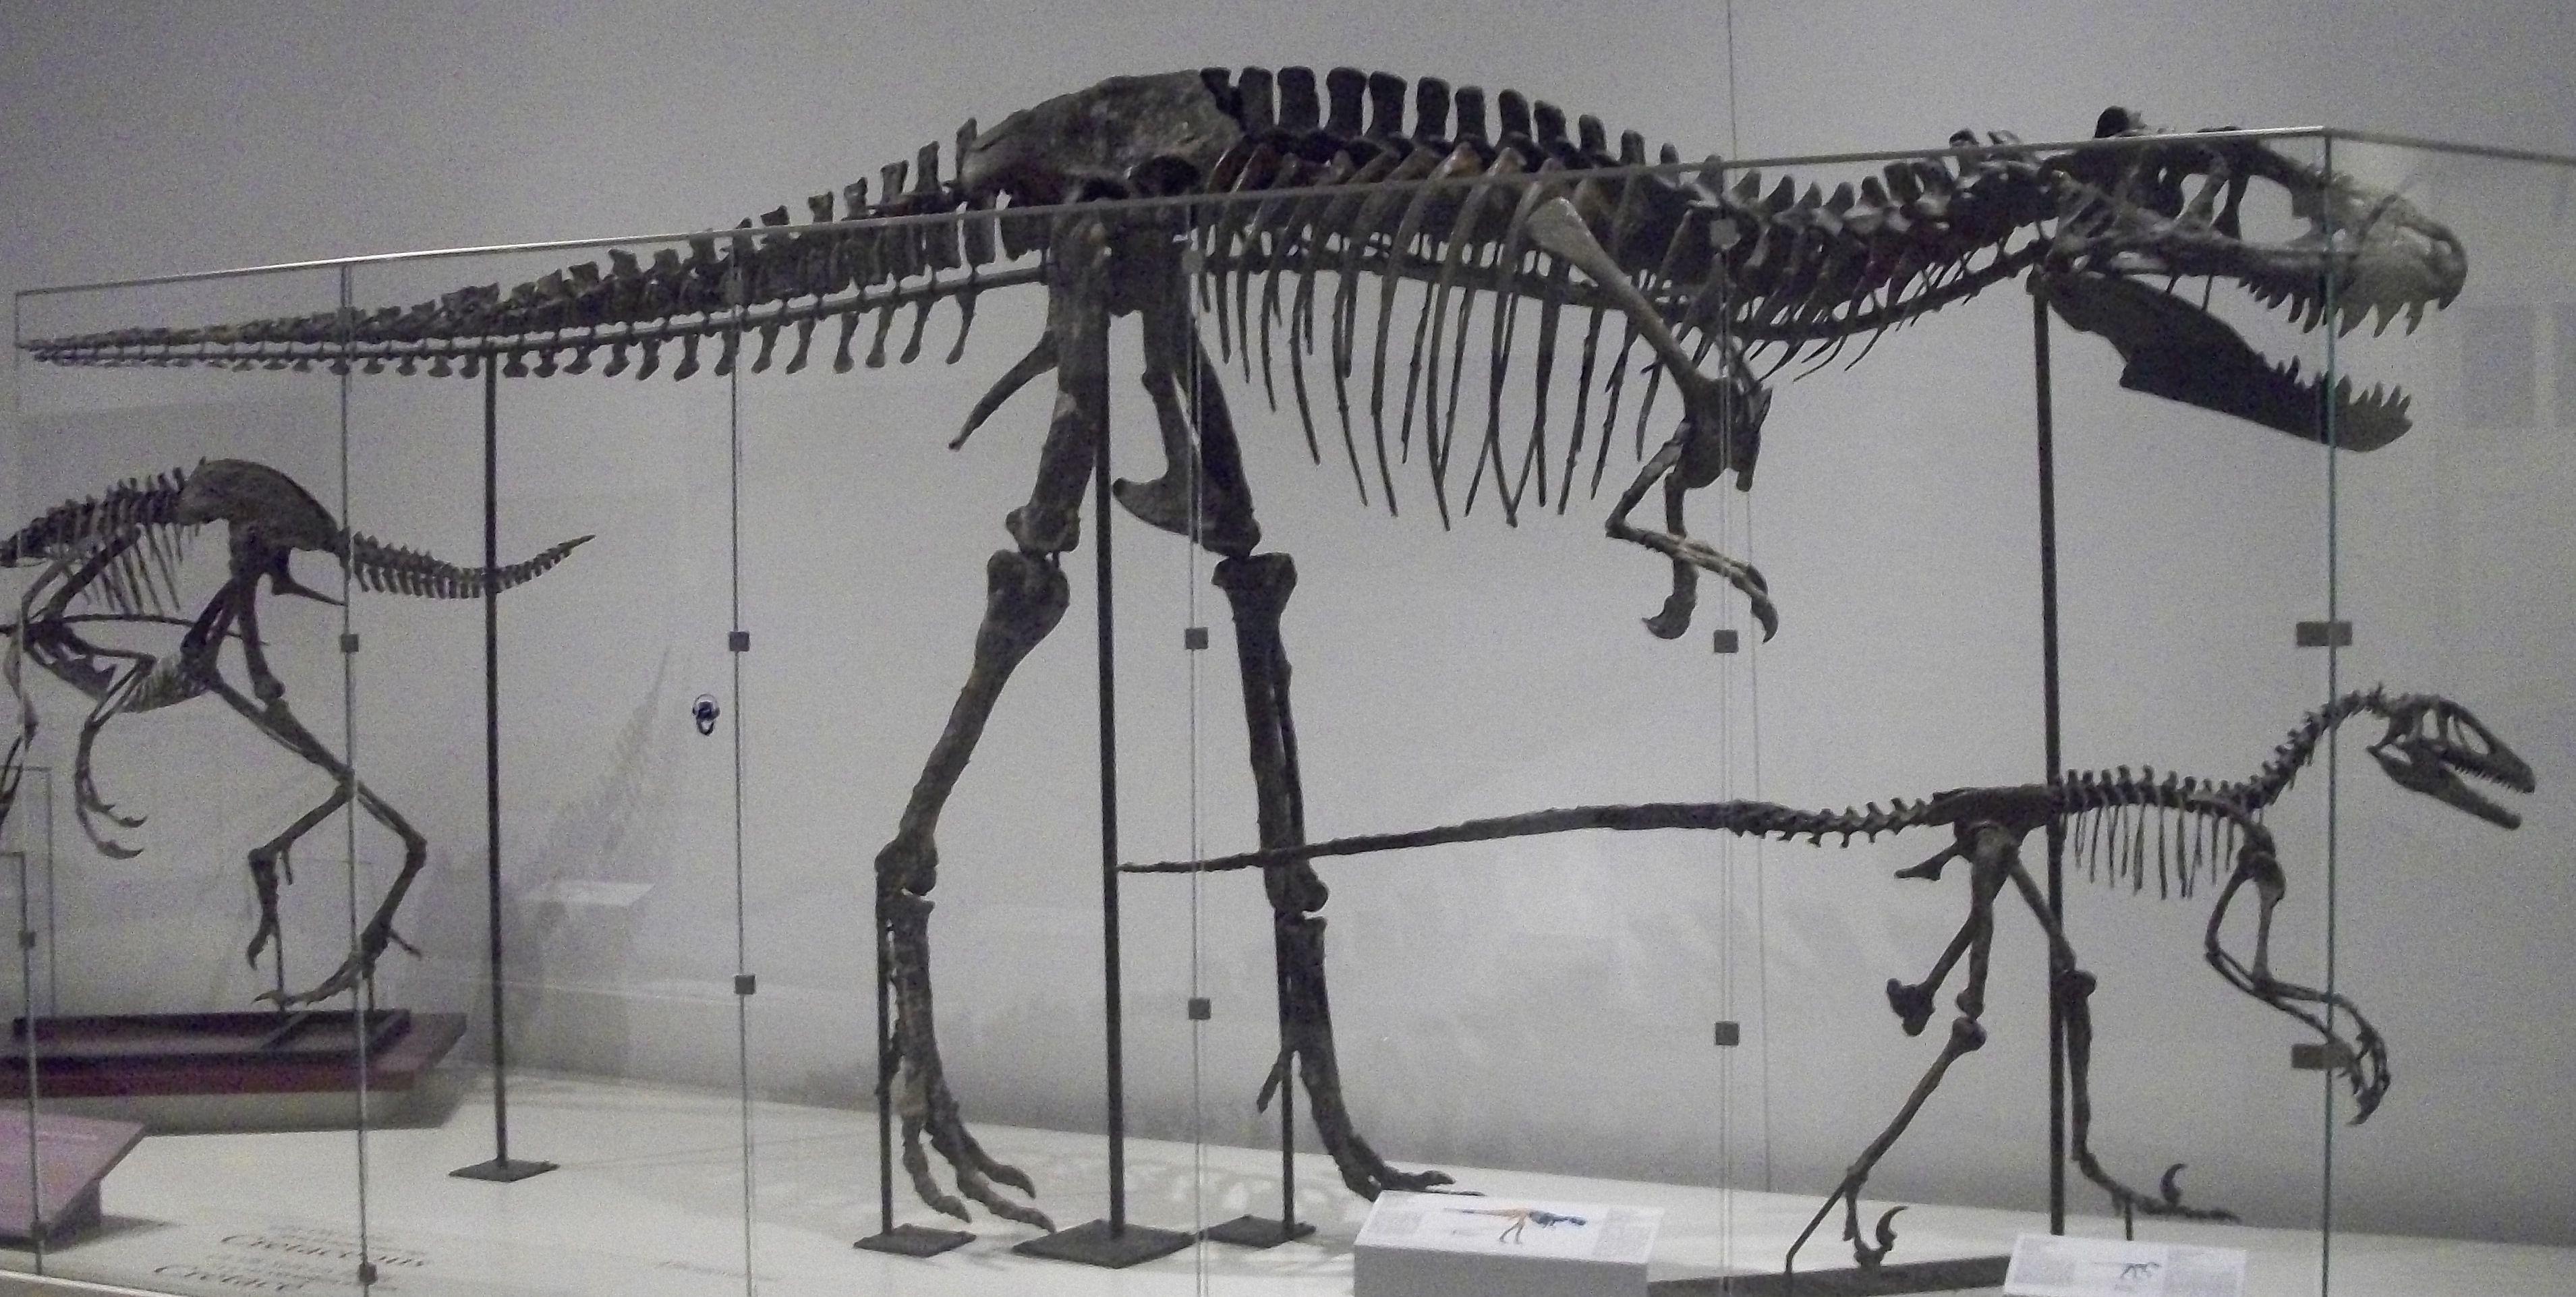 Albertosaurus_and_Deinonychus_at_the_Royal_Ontario_Musem.JPG